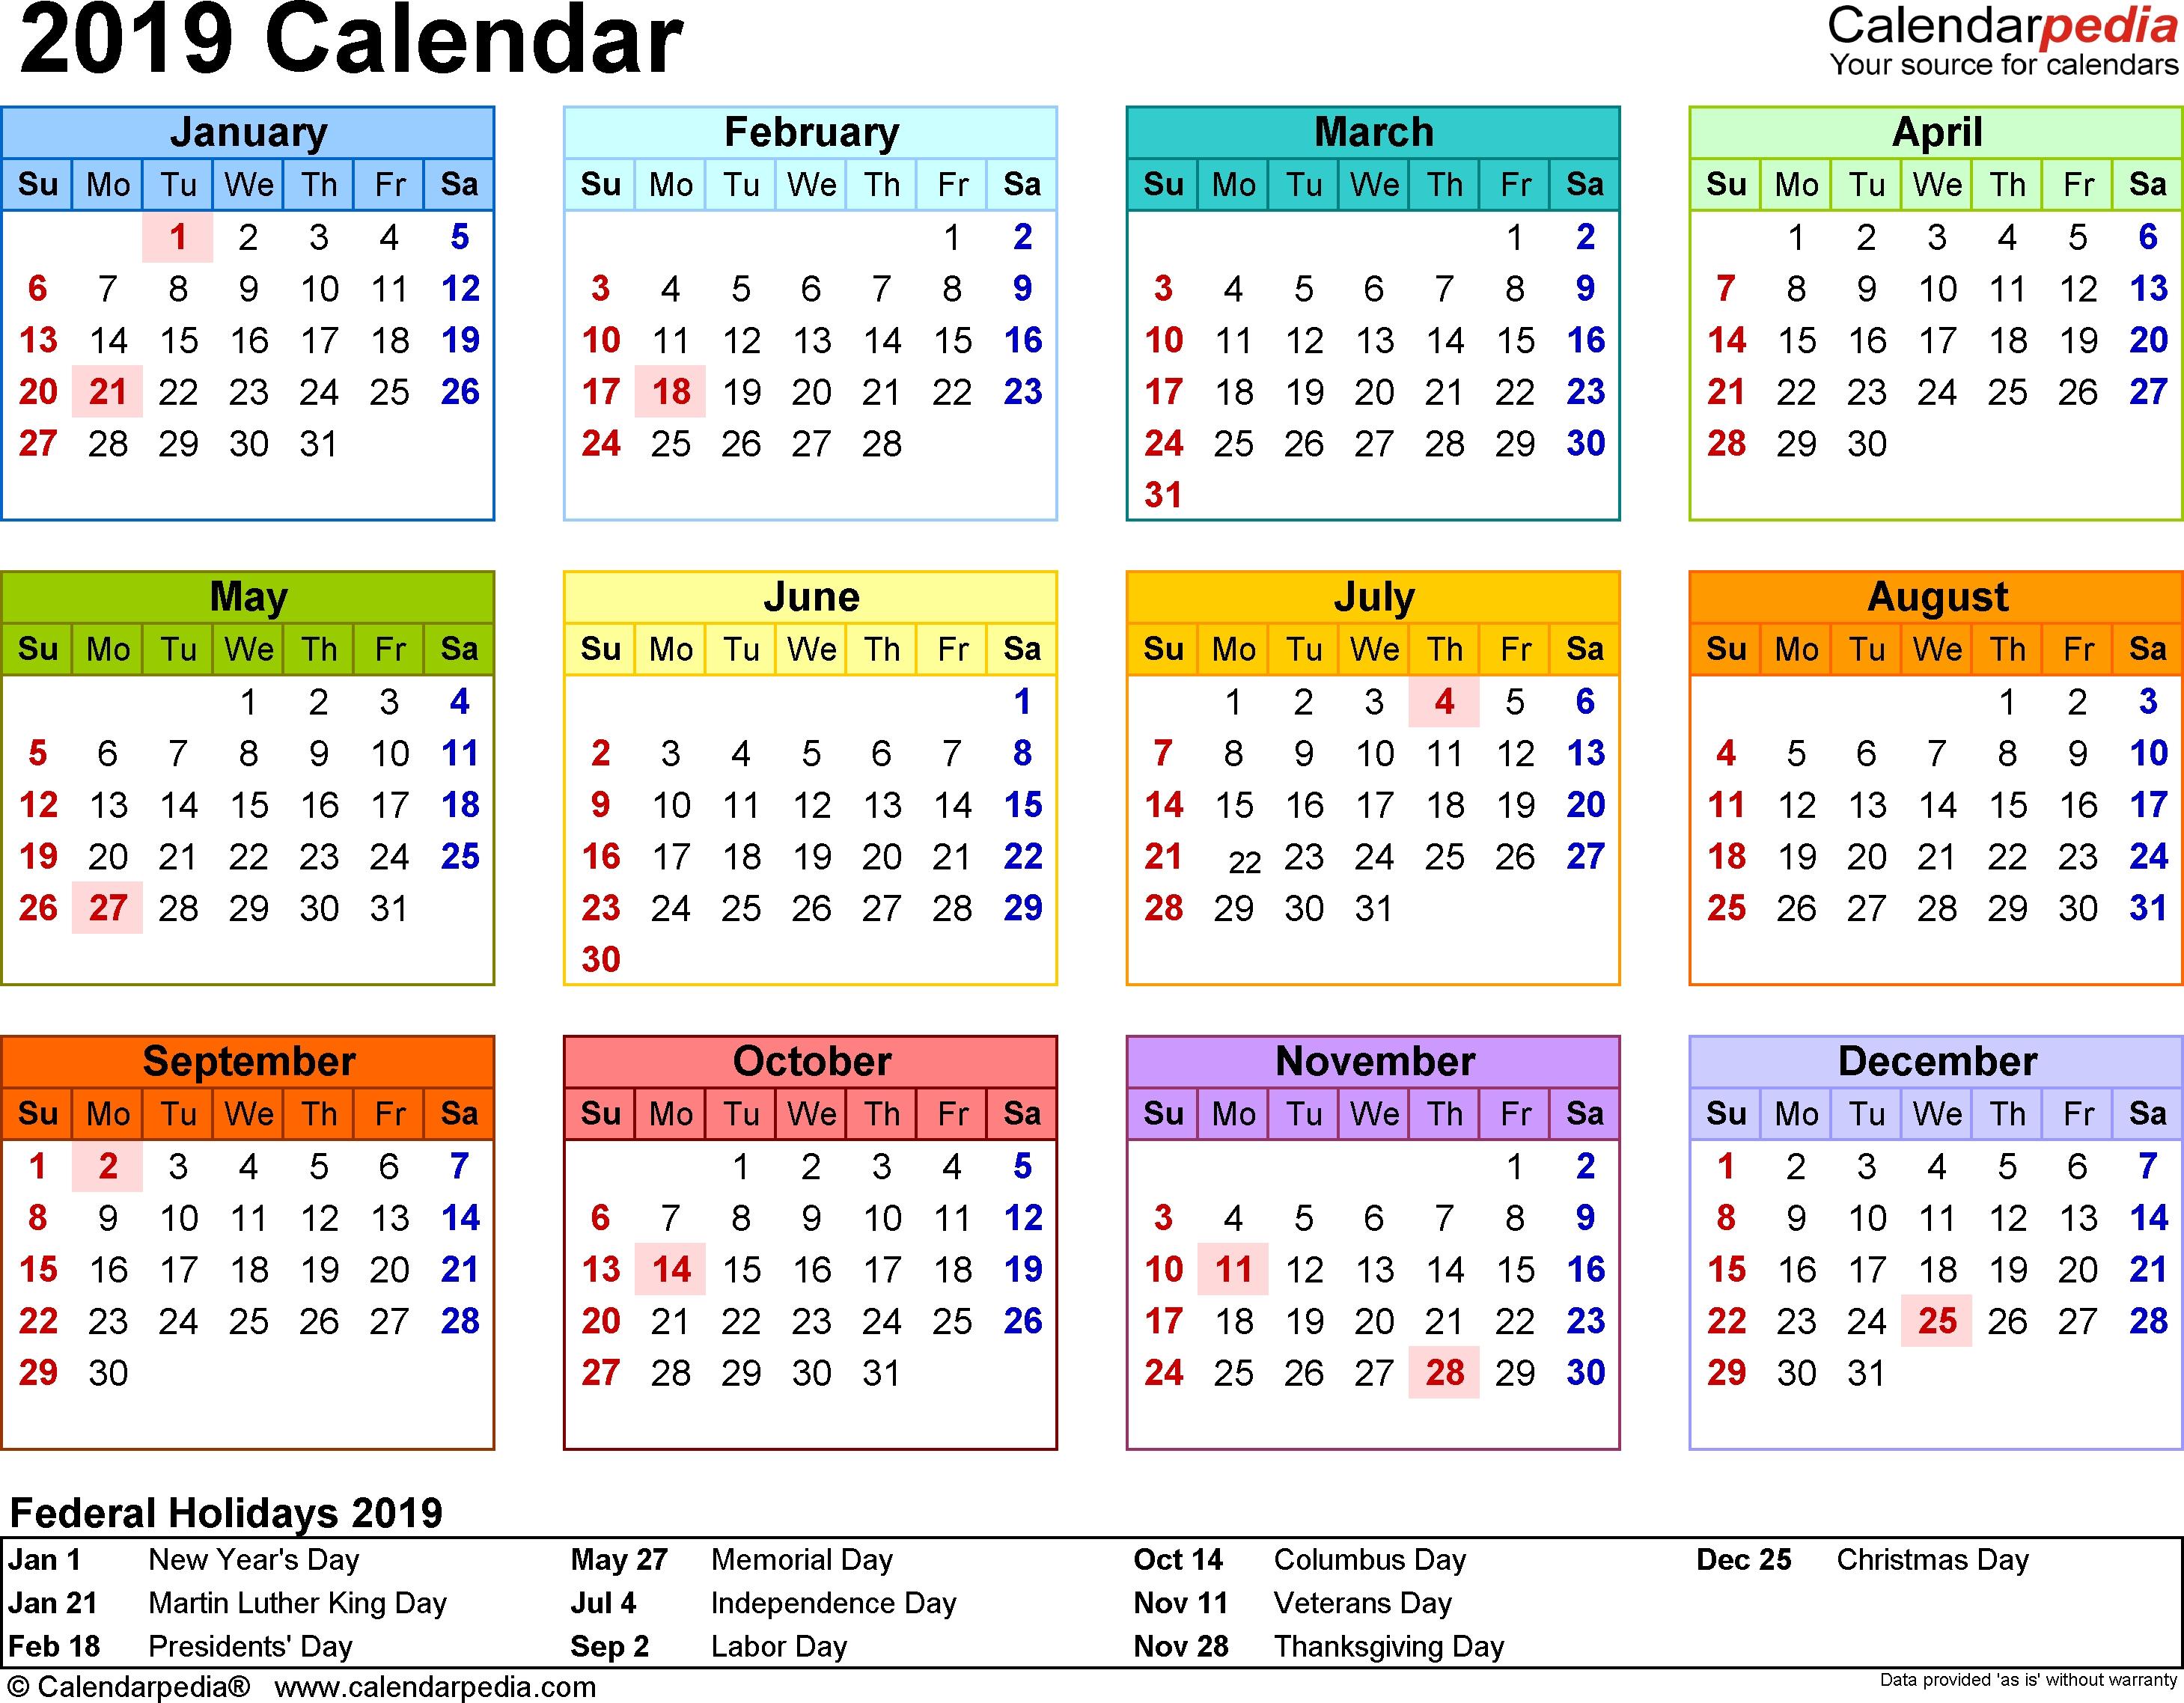 2019 Calendar Template #2019Calendar #2019Printablecalendar